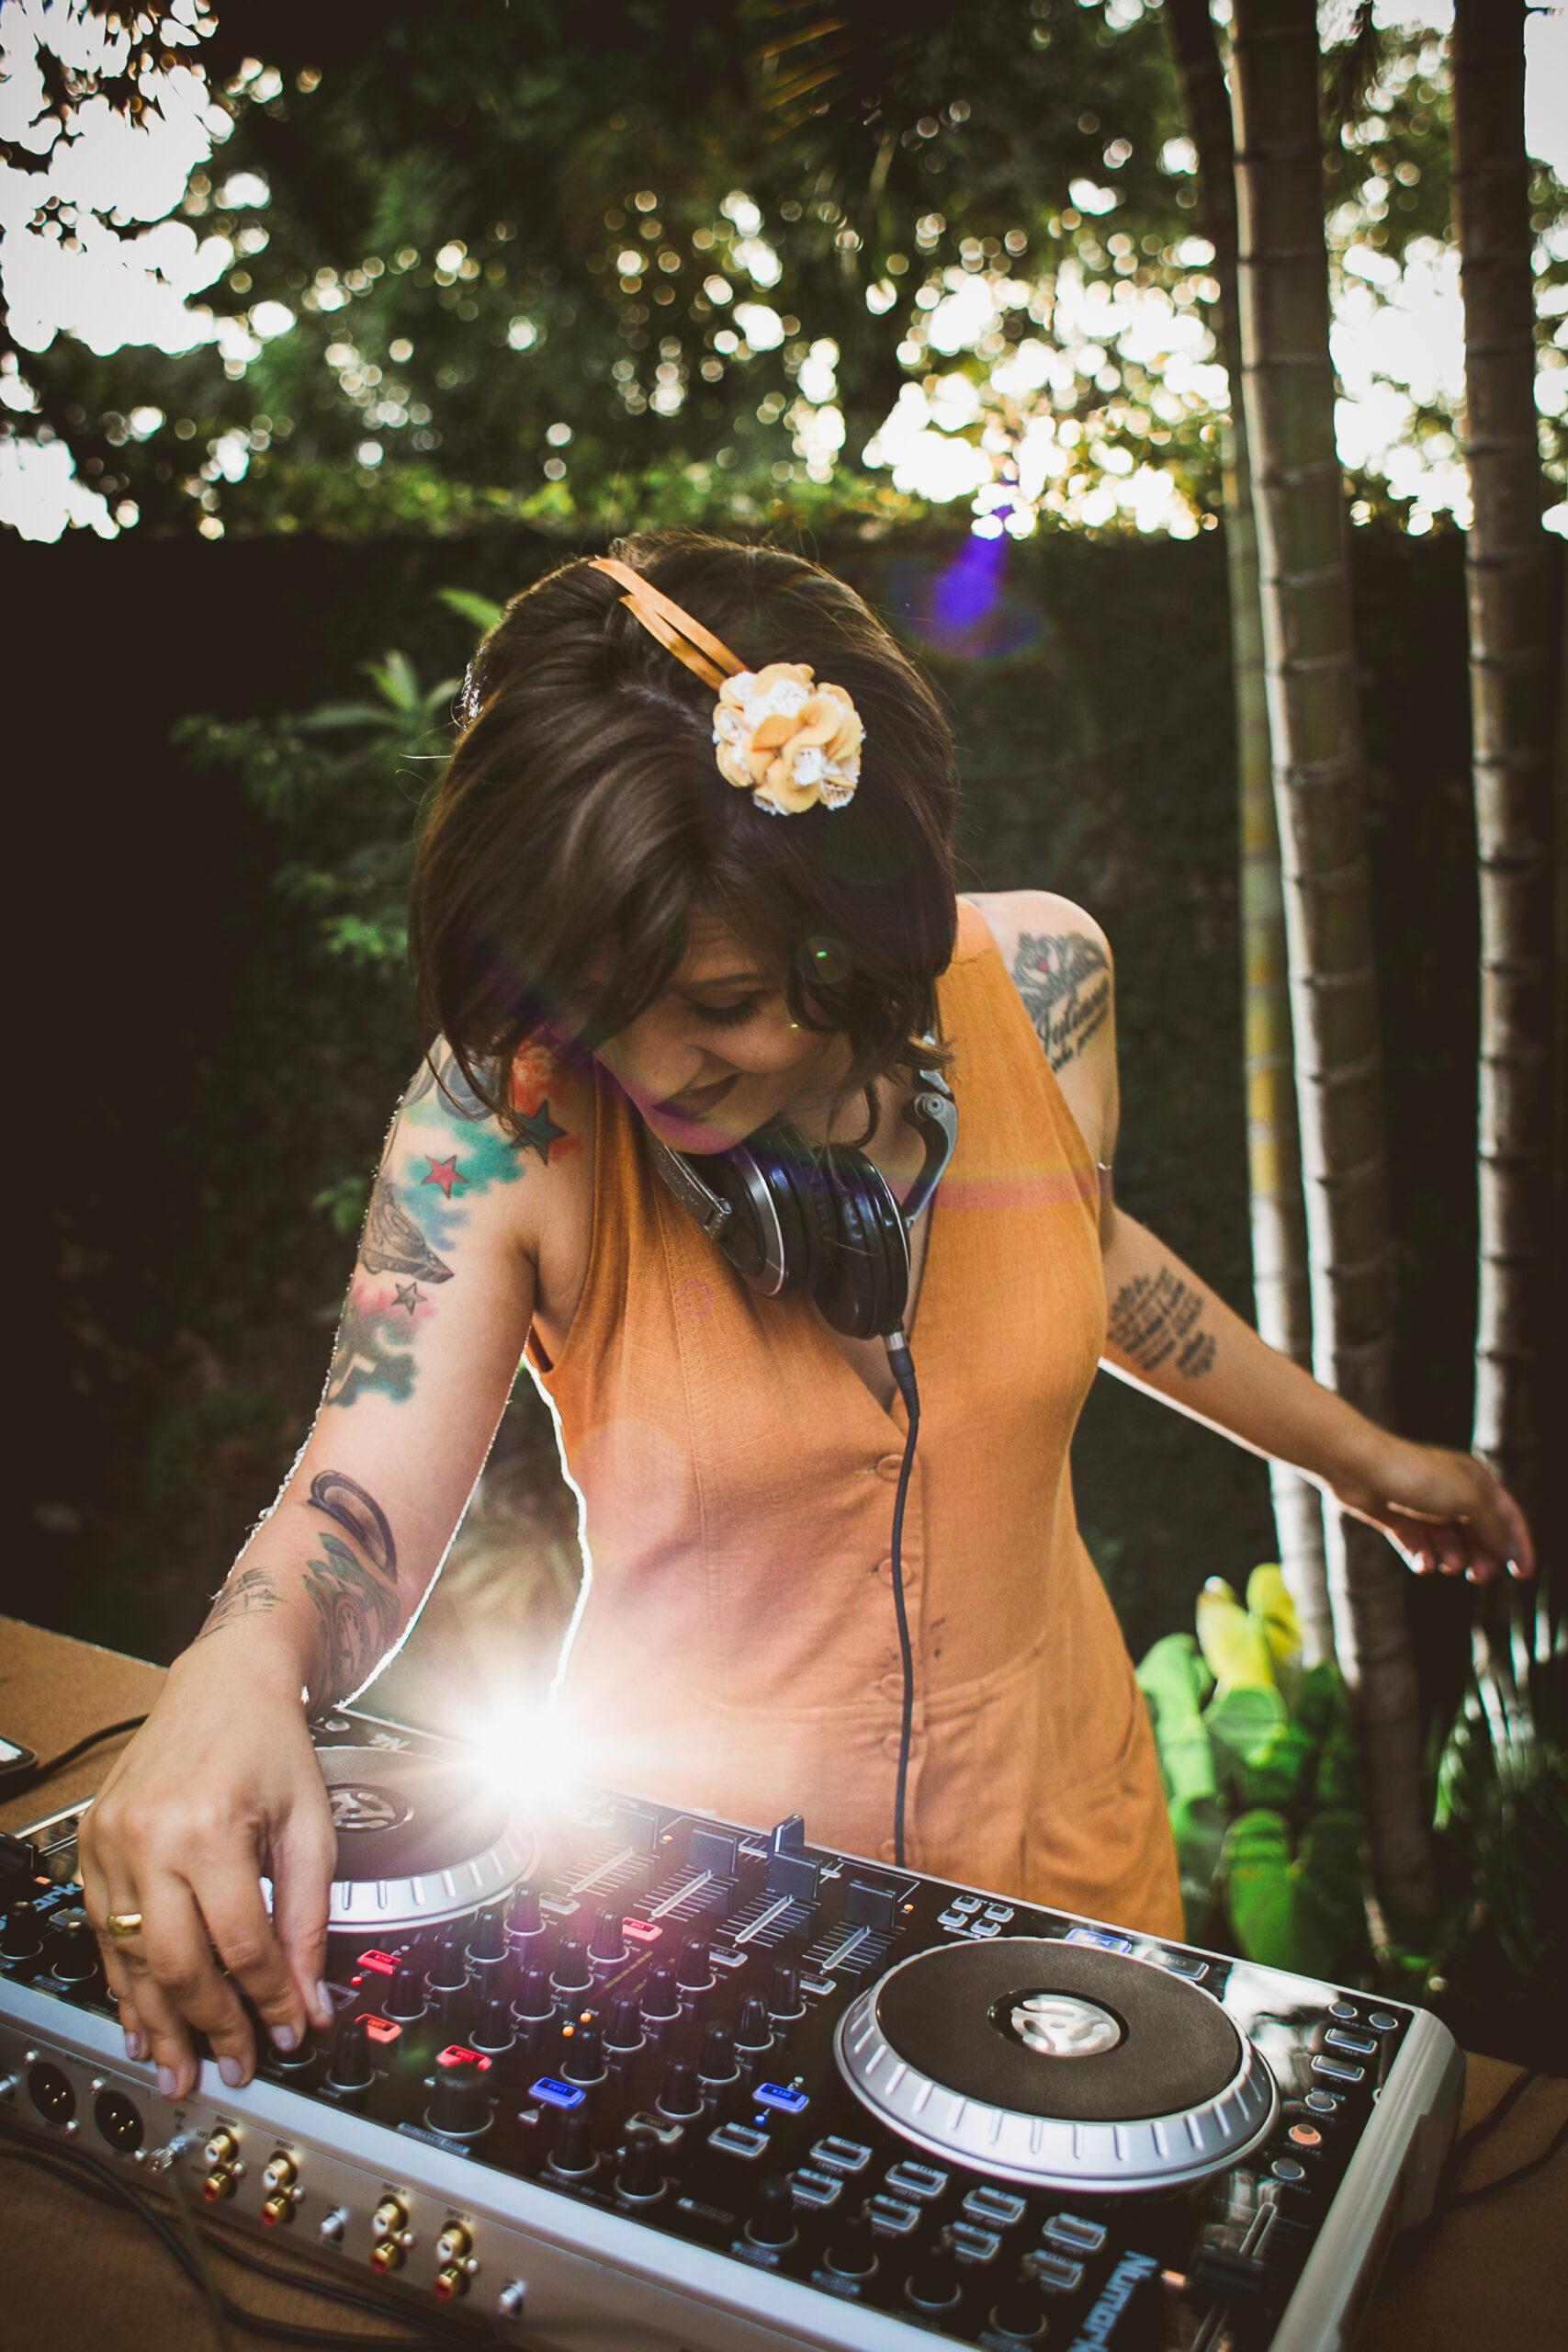 DJ MULHER BELO HORIZONTE